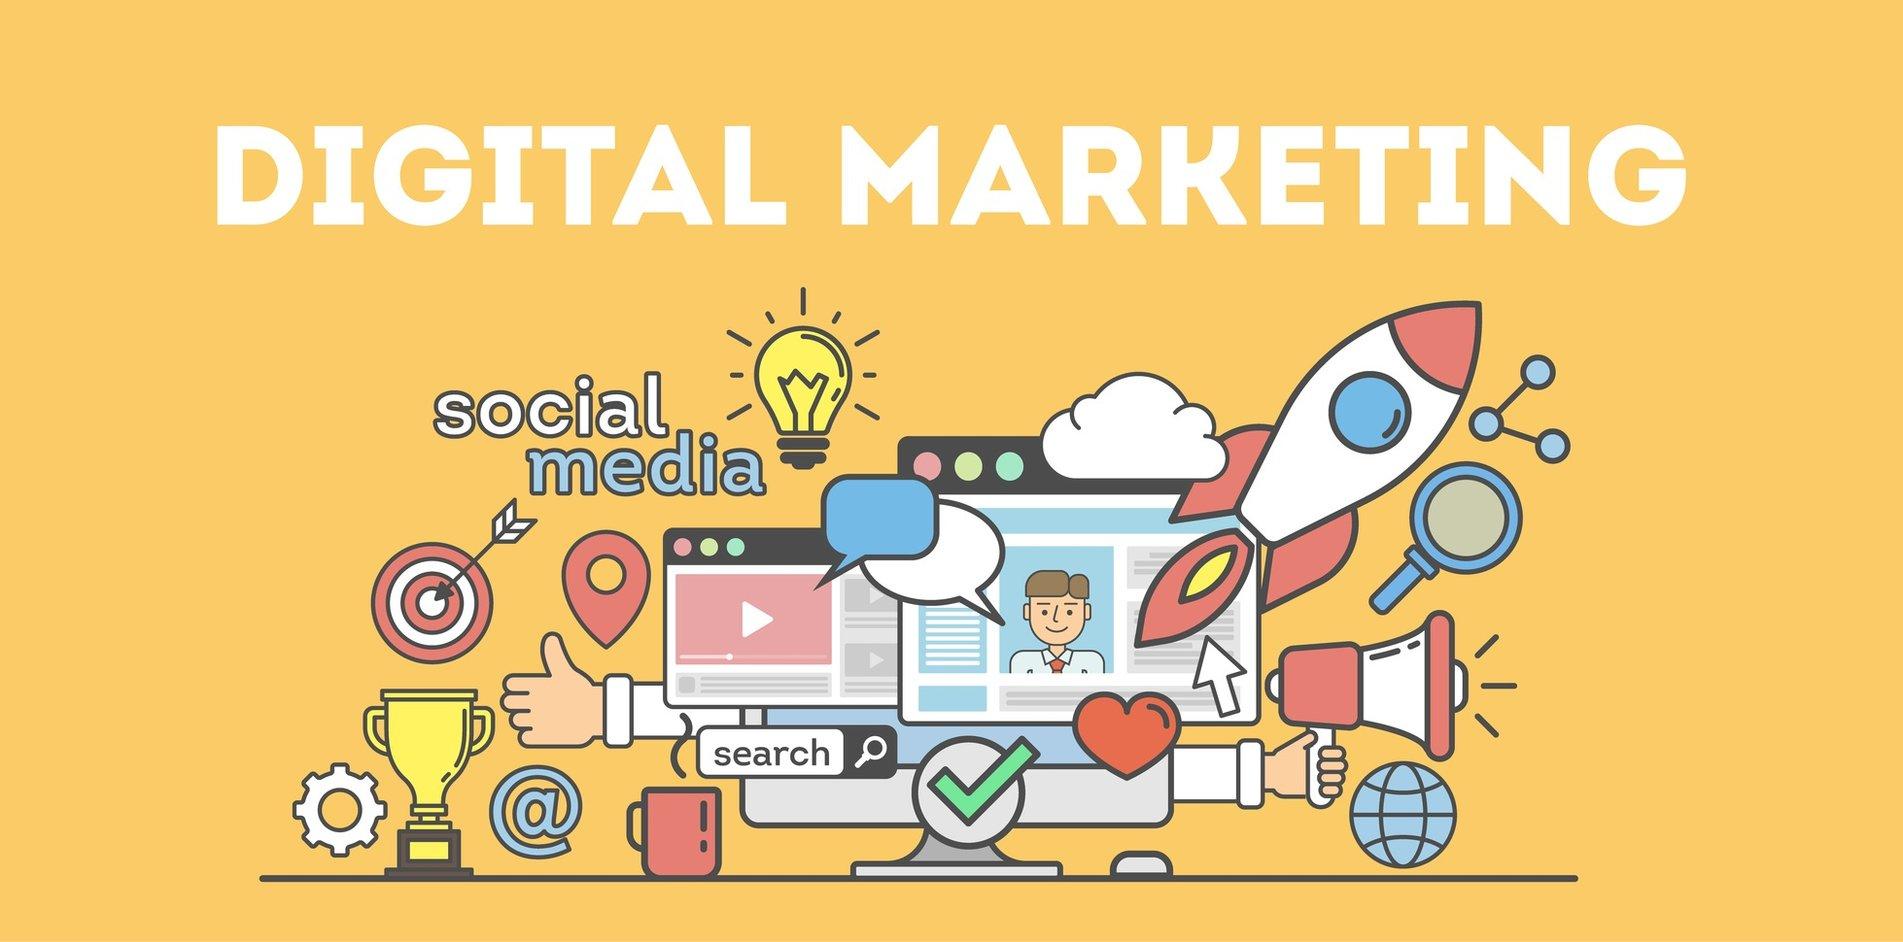 Digital Marketing's Biggest Stumbling Block: Integration